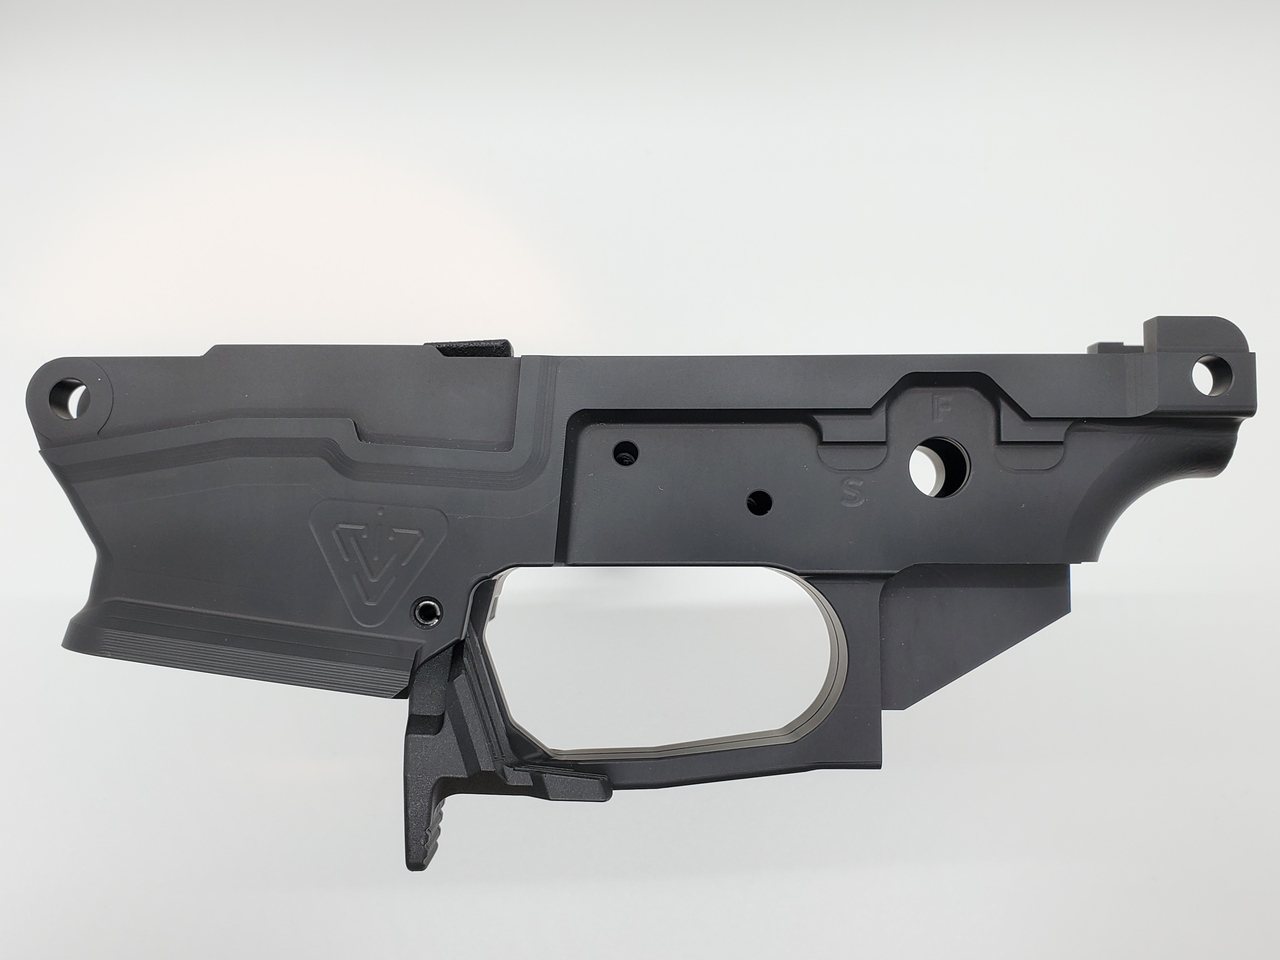 lingle industries stribog cz scorpion mags 9mm pcc pistol caliber carbine